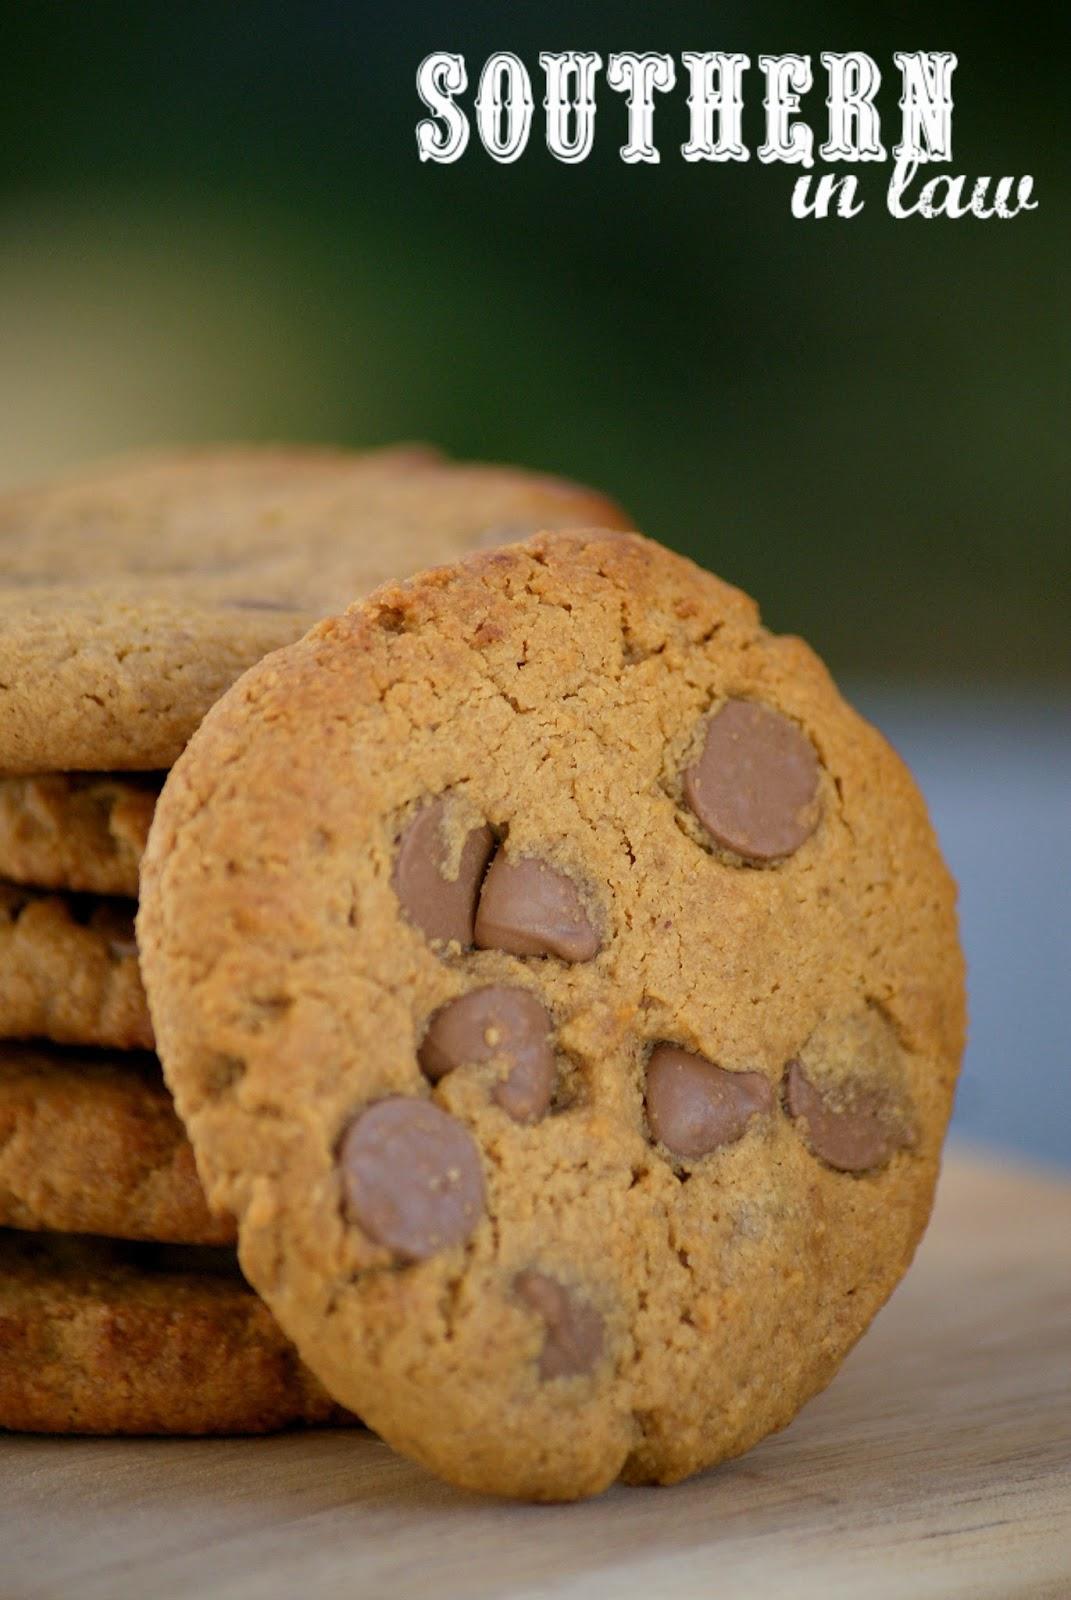 Healthy Peanut Butter Chocolate Chip Cookie Recipe - low fat, gluten free, healthy, low sugar - Peanut Flour Cookies Recipe